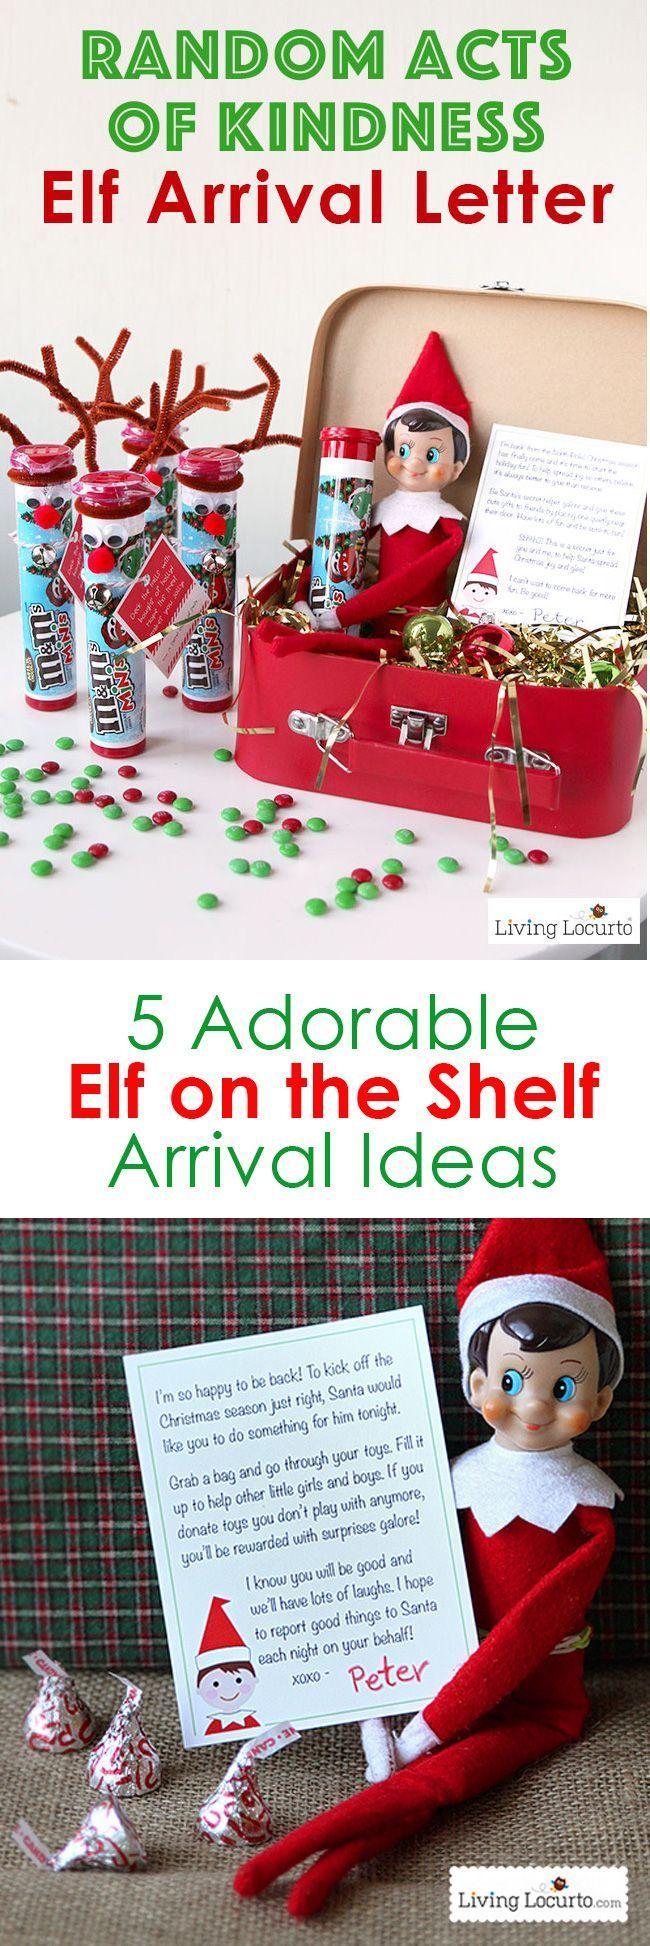 Creative Elf on the Shelf Arrival Ideas! Unique printables